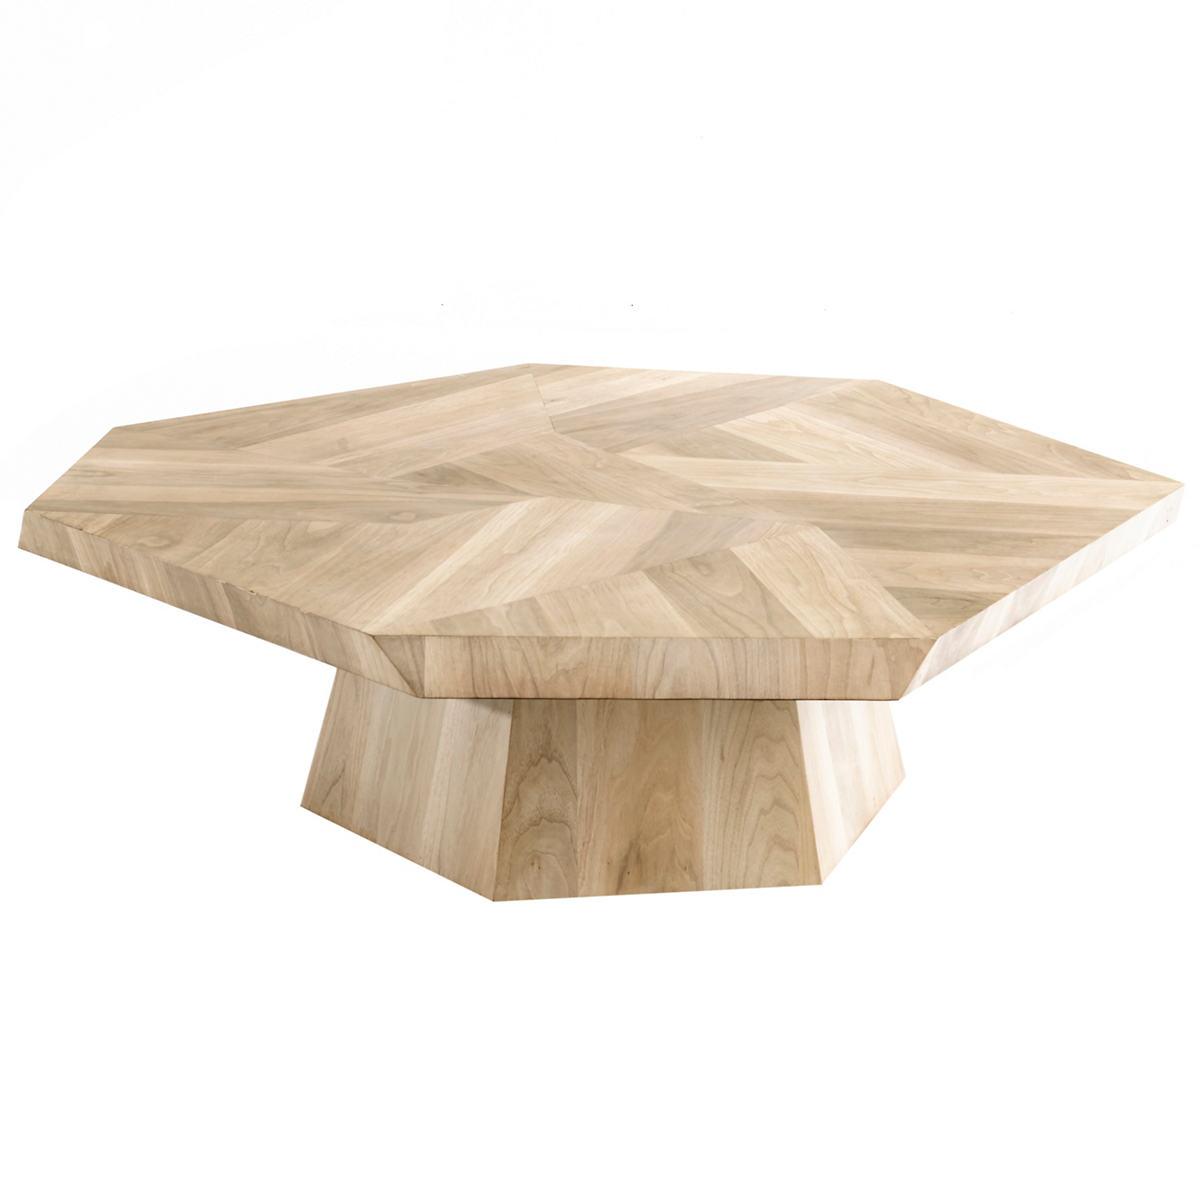 Avalon Ashen Walnut Coffee Table